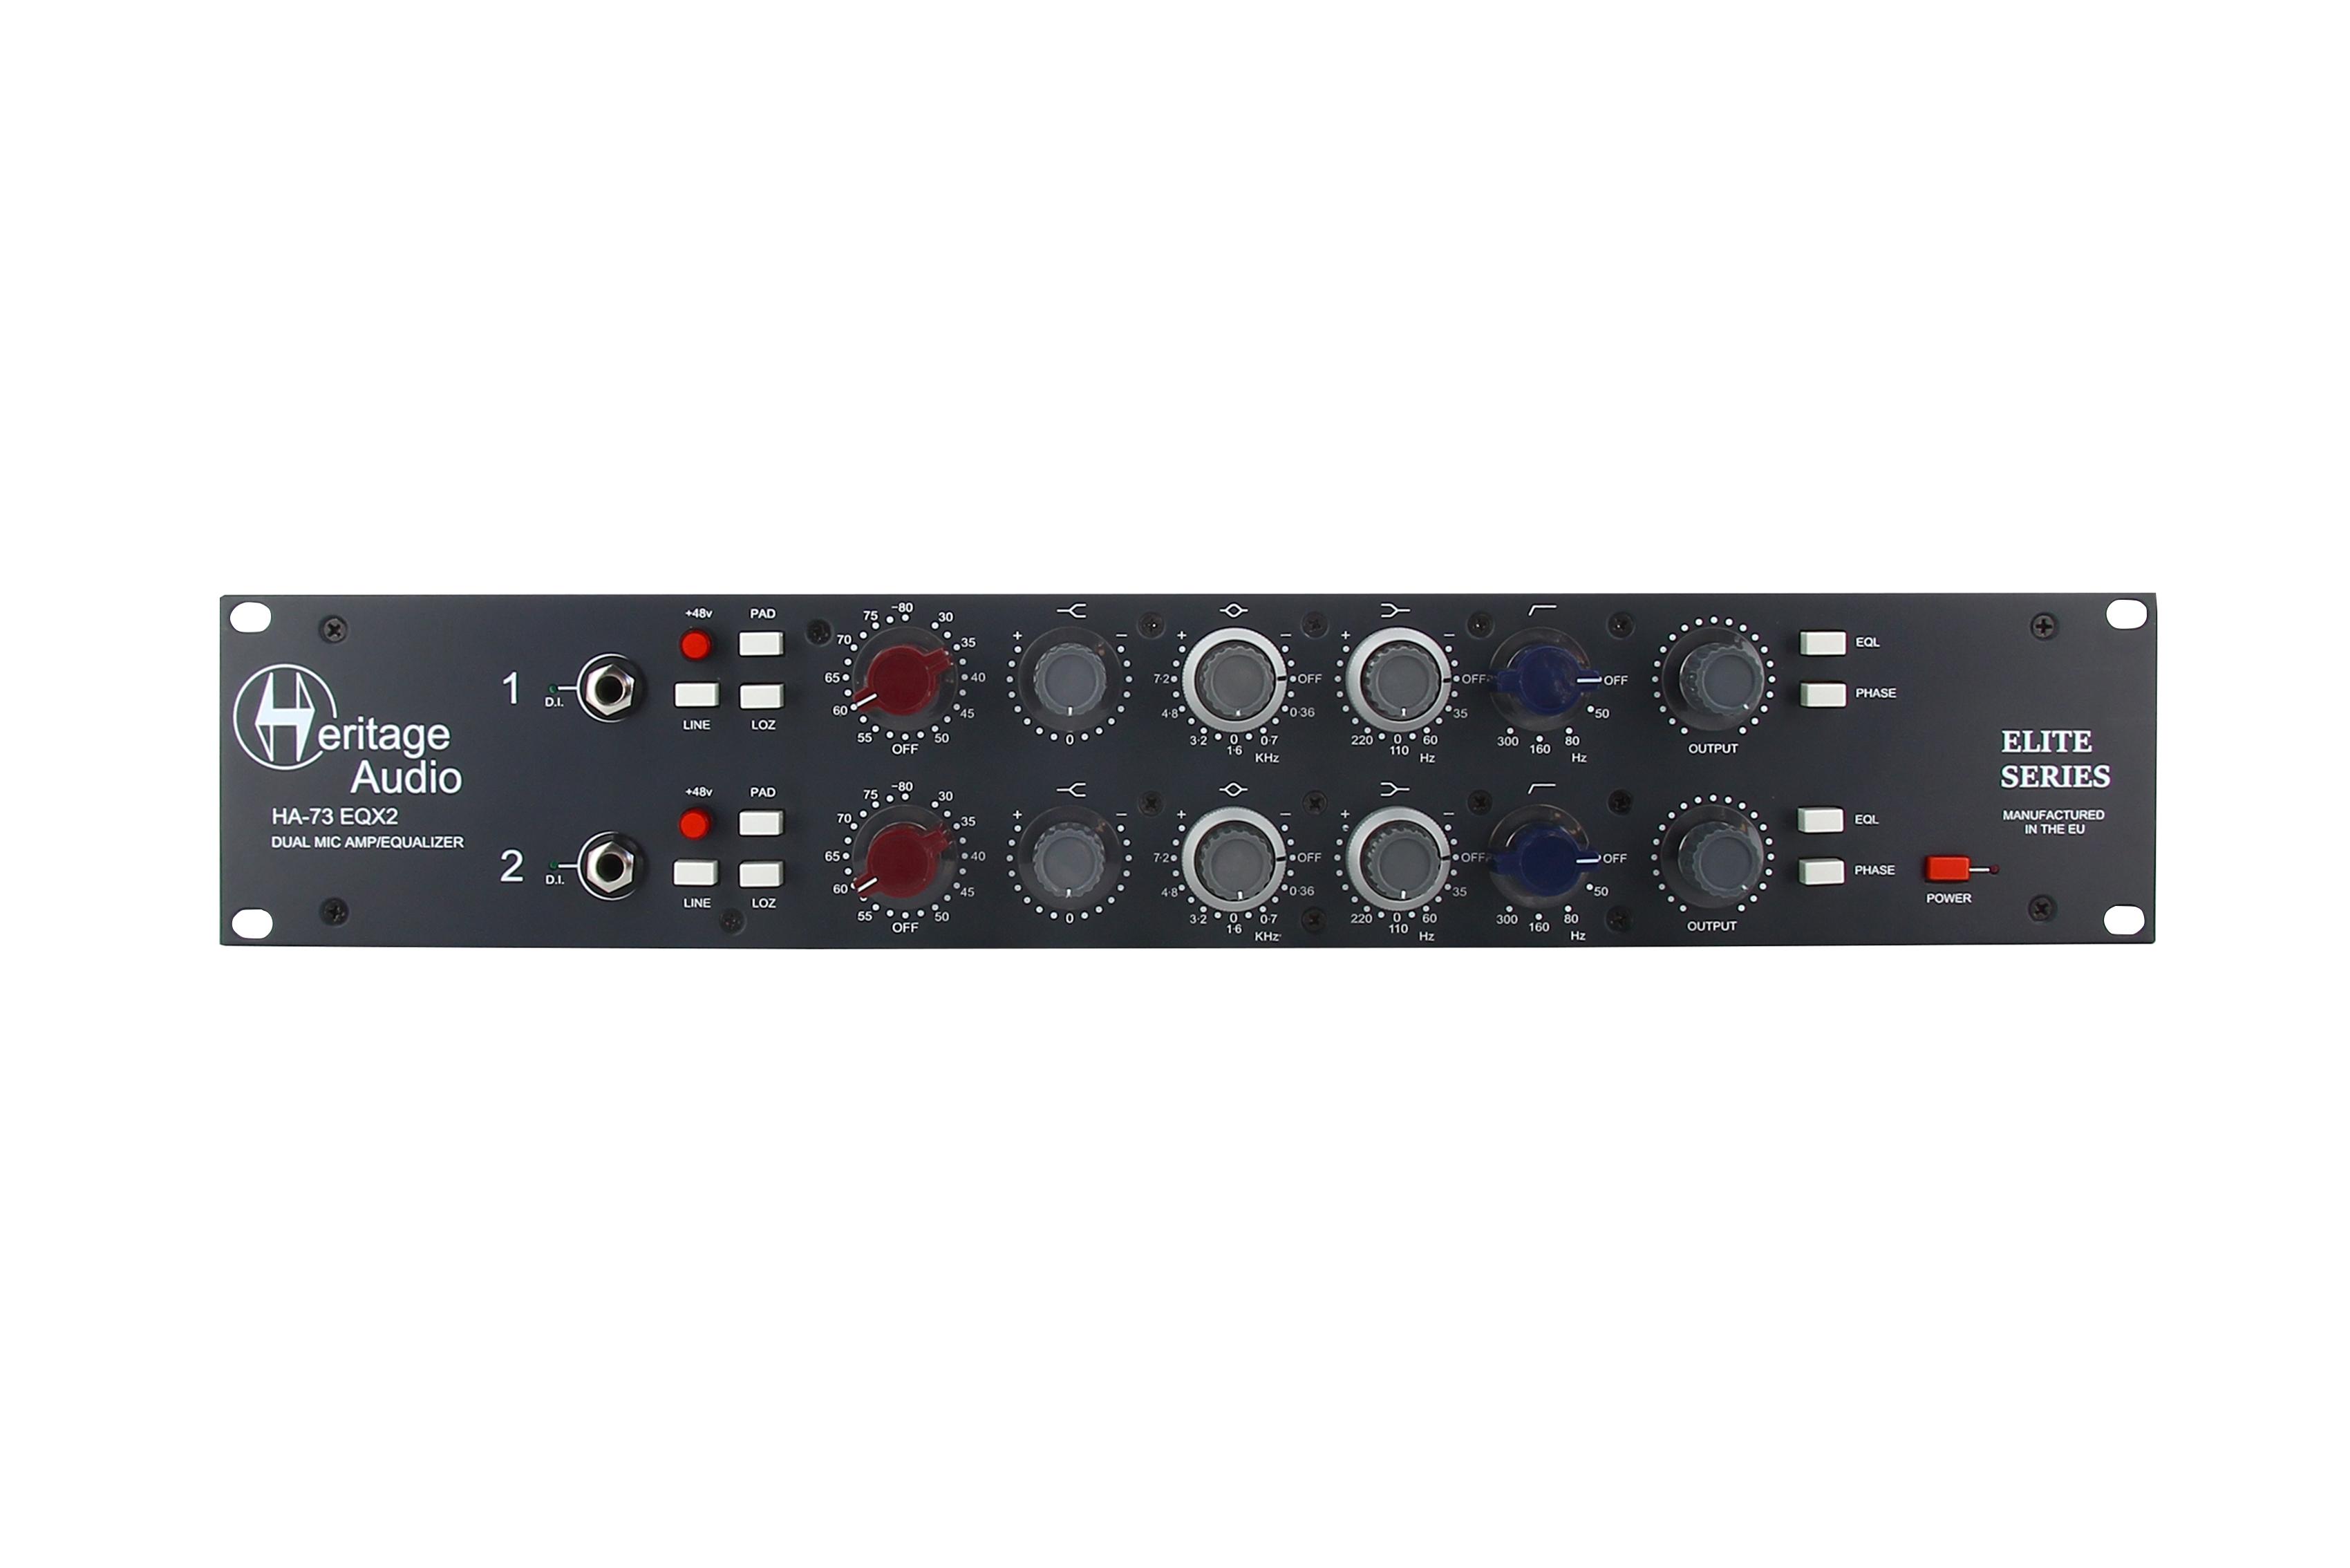 News: Heritage Audio präsentiert Mikrofonvorverstärker und Equalizer HA73EQX2